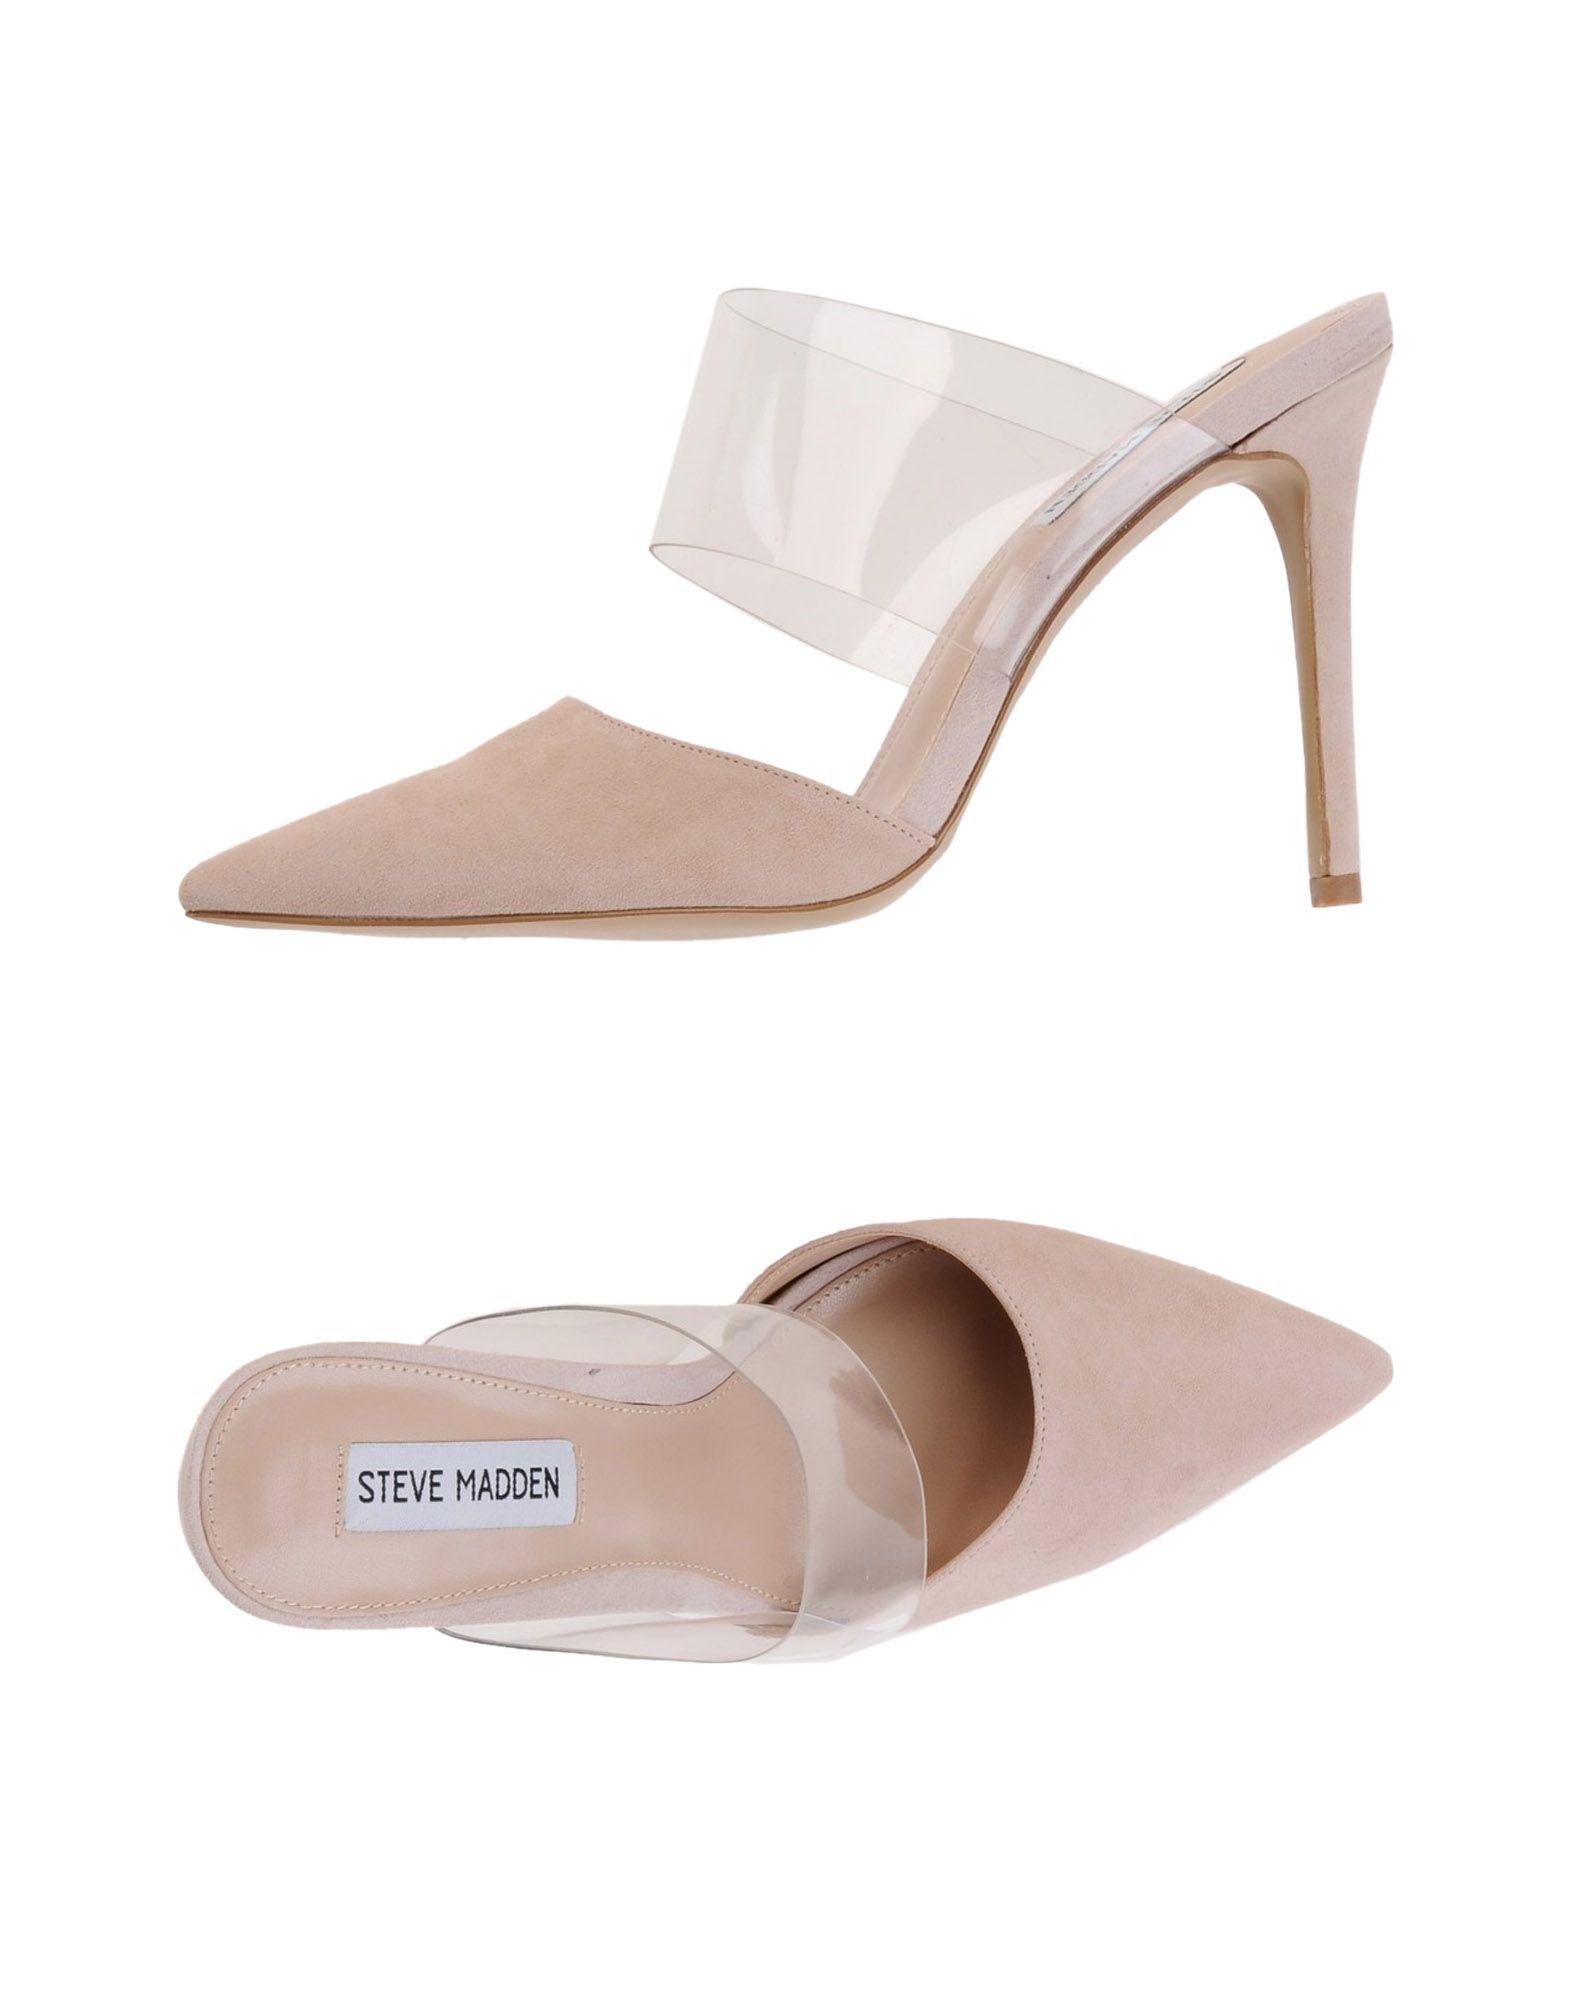 Steve Madden Plaza High Heel Sandale Sandale Heel Gutes Preis-Leistungs-Verhältnis, es lohnt sich 5d4a4b